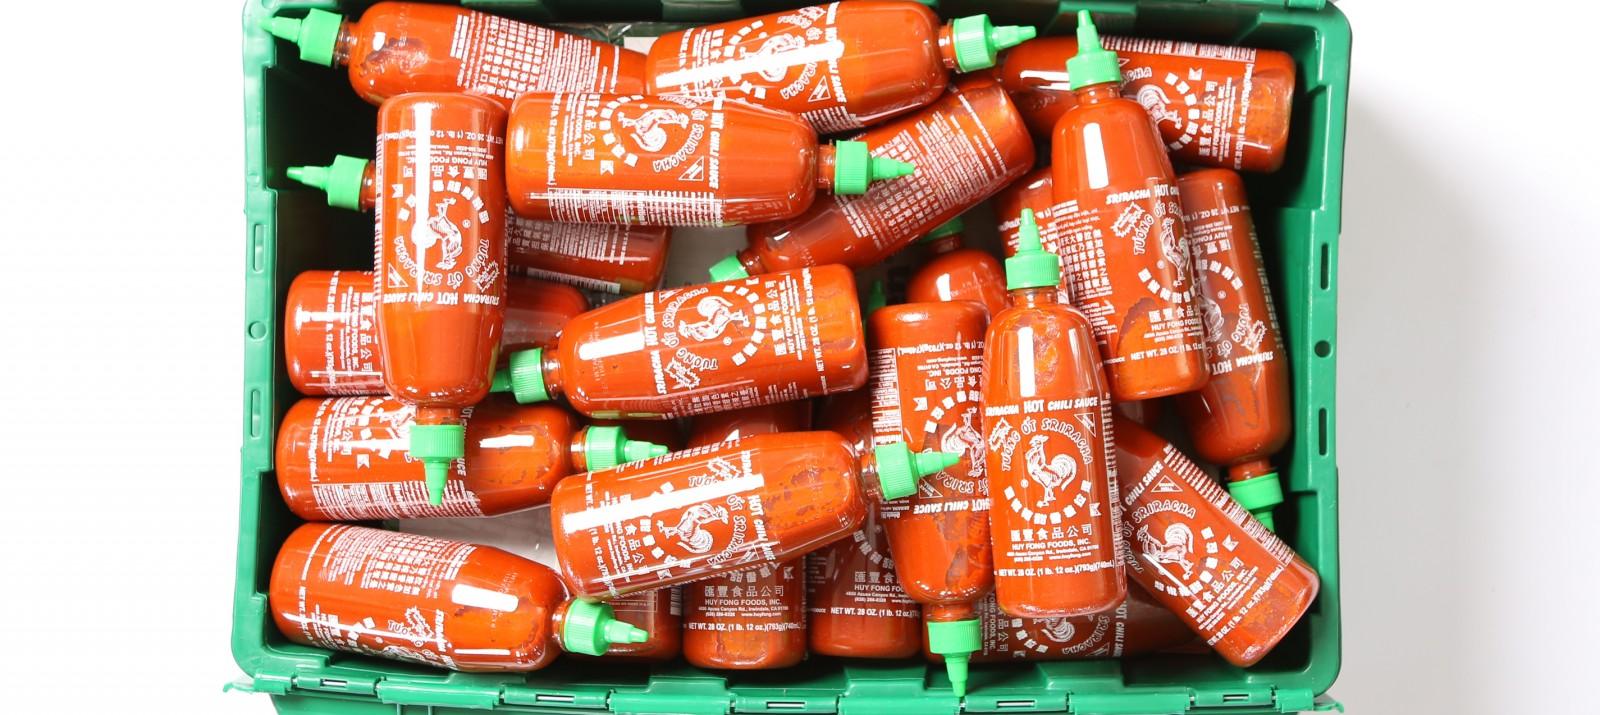 A MakeSpace storage bin full of 63 Sriracha bottles.